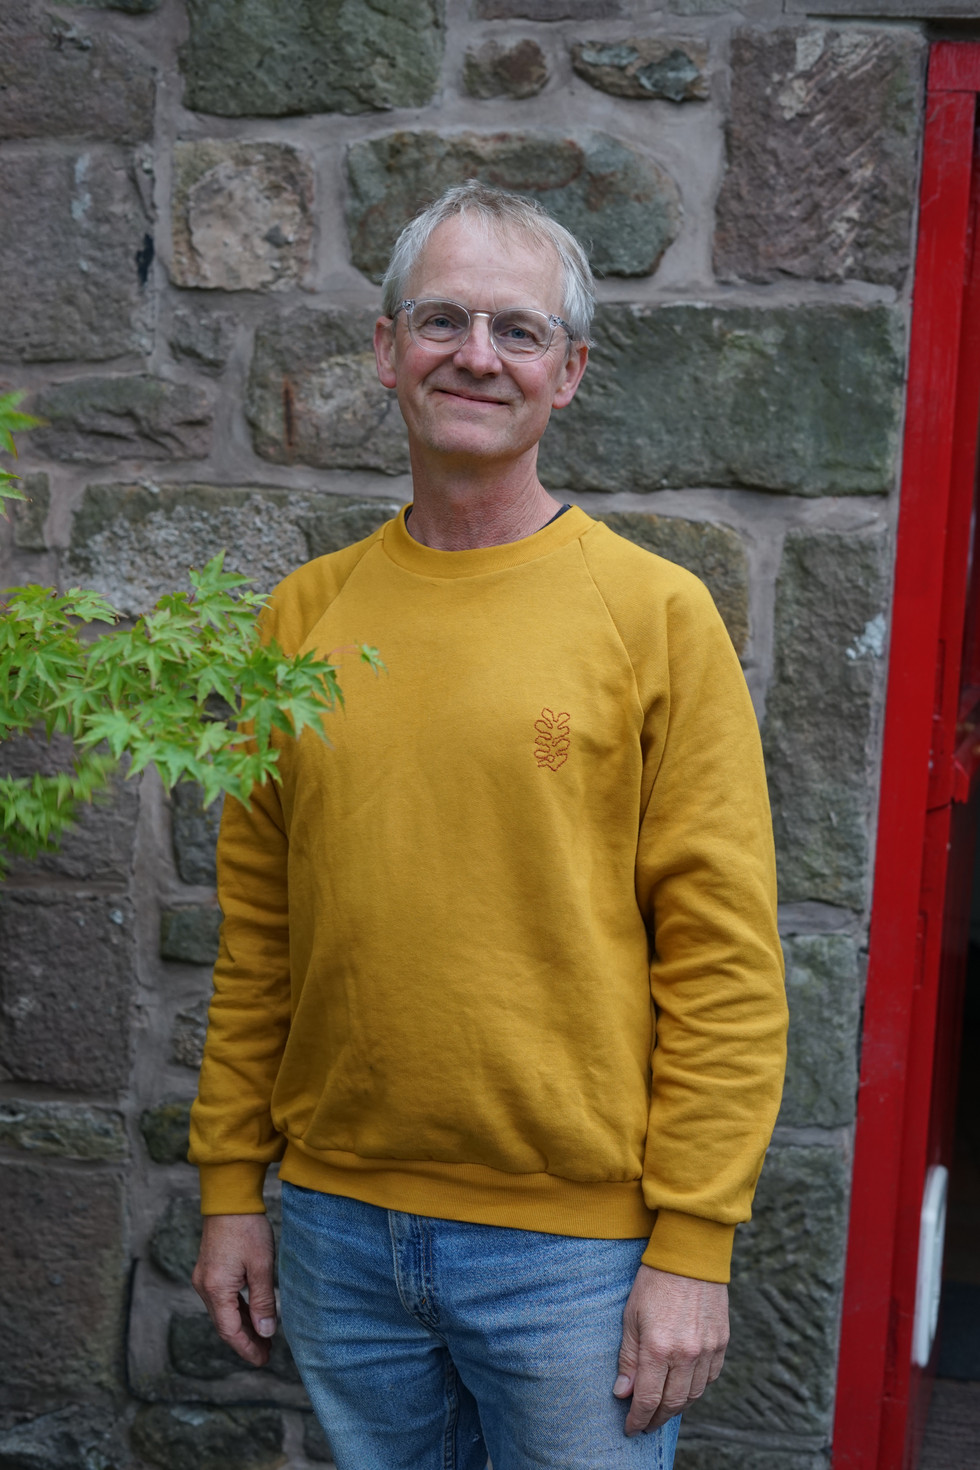 Martins Sweatshirt